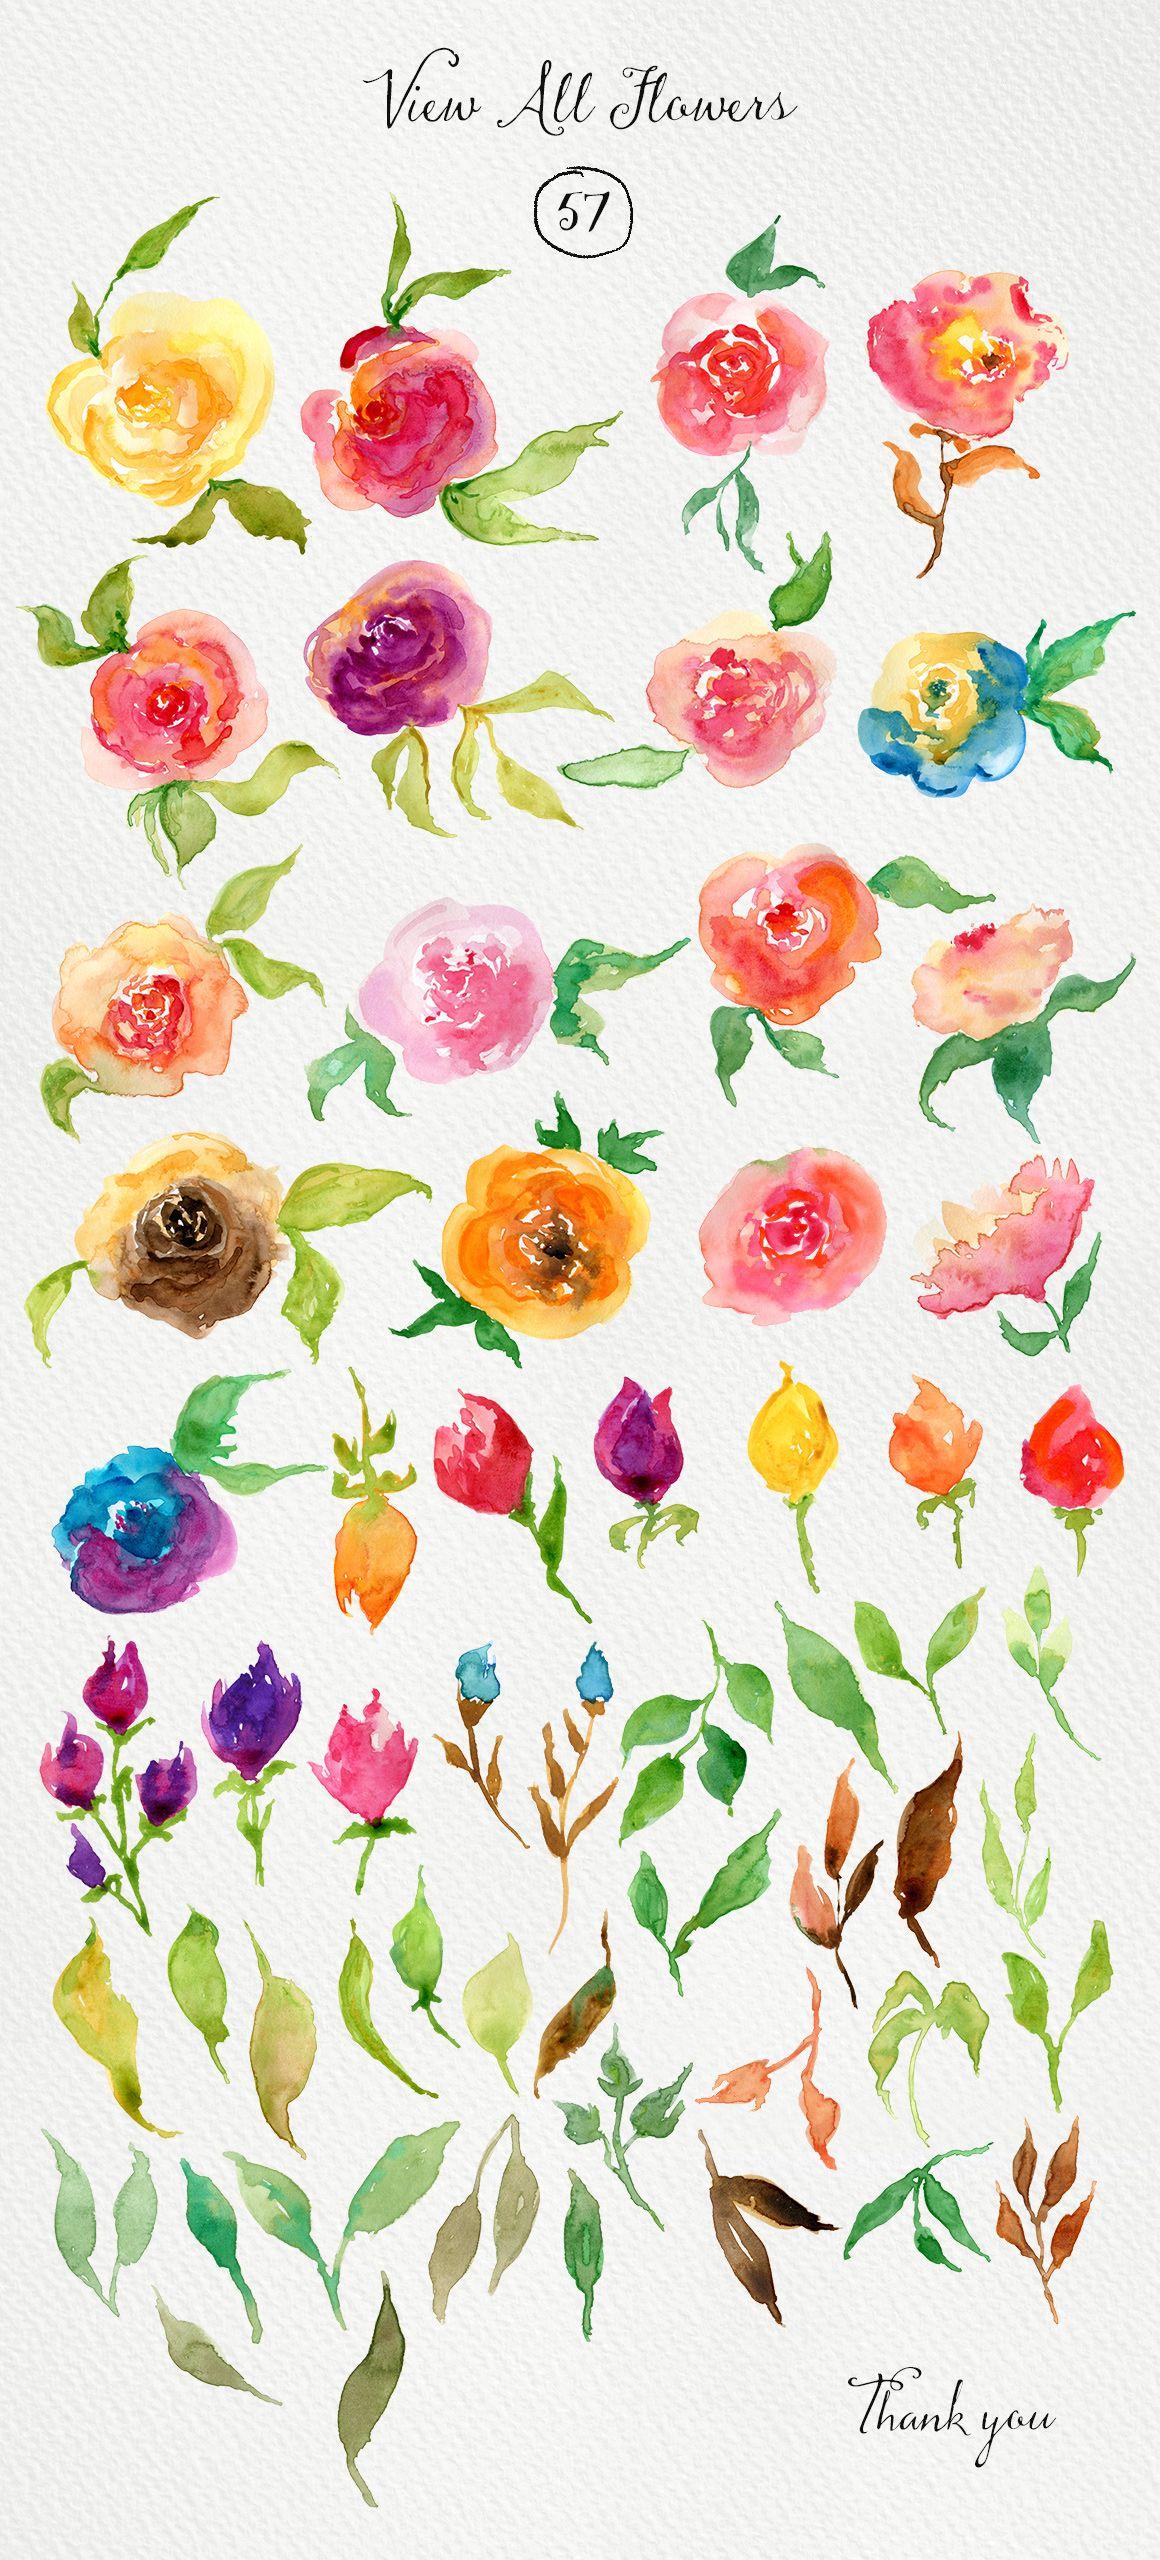 Color art floral wonders - Watercolor Roses Diy By Webvilla On Creative Market